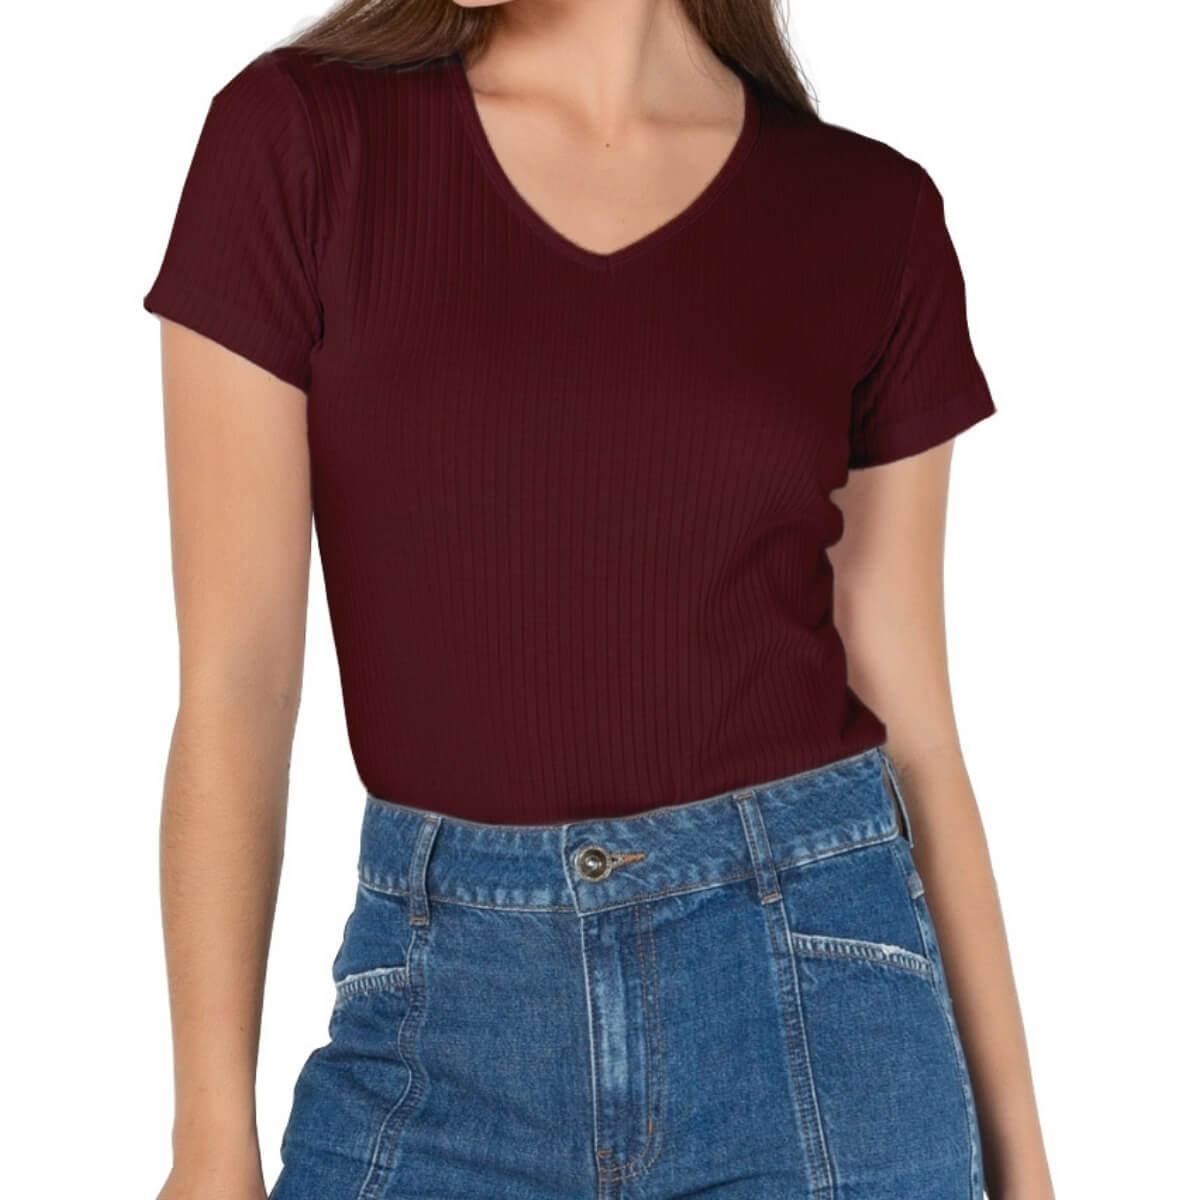 Camiseta Feminina Ribana Premium Vinho